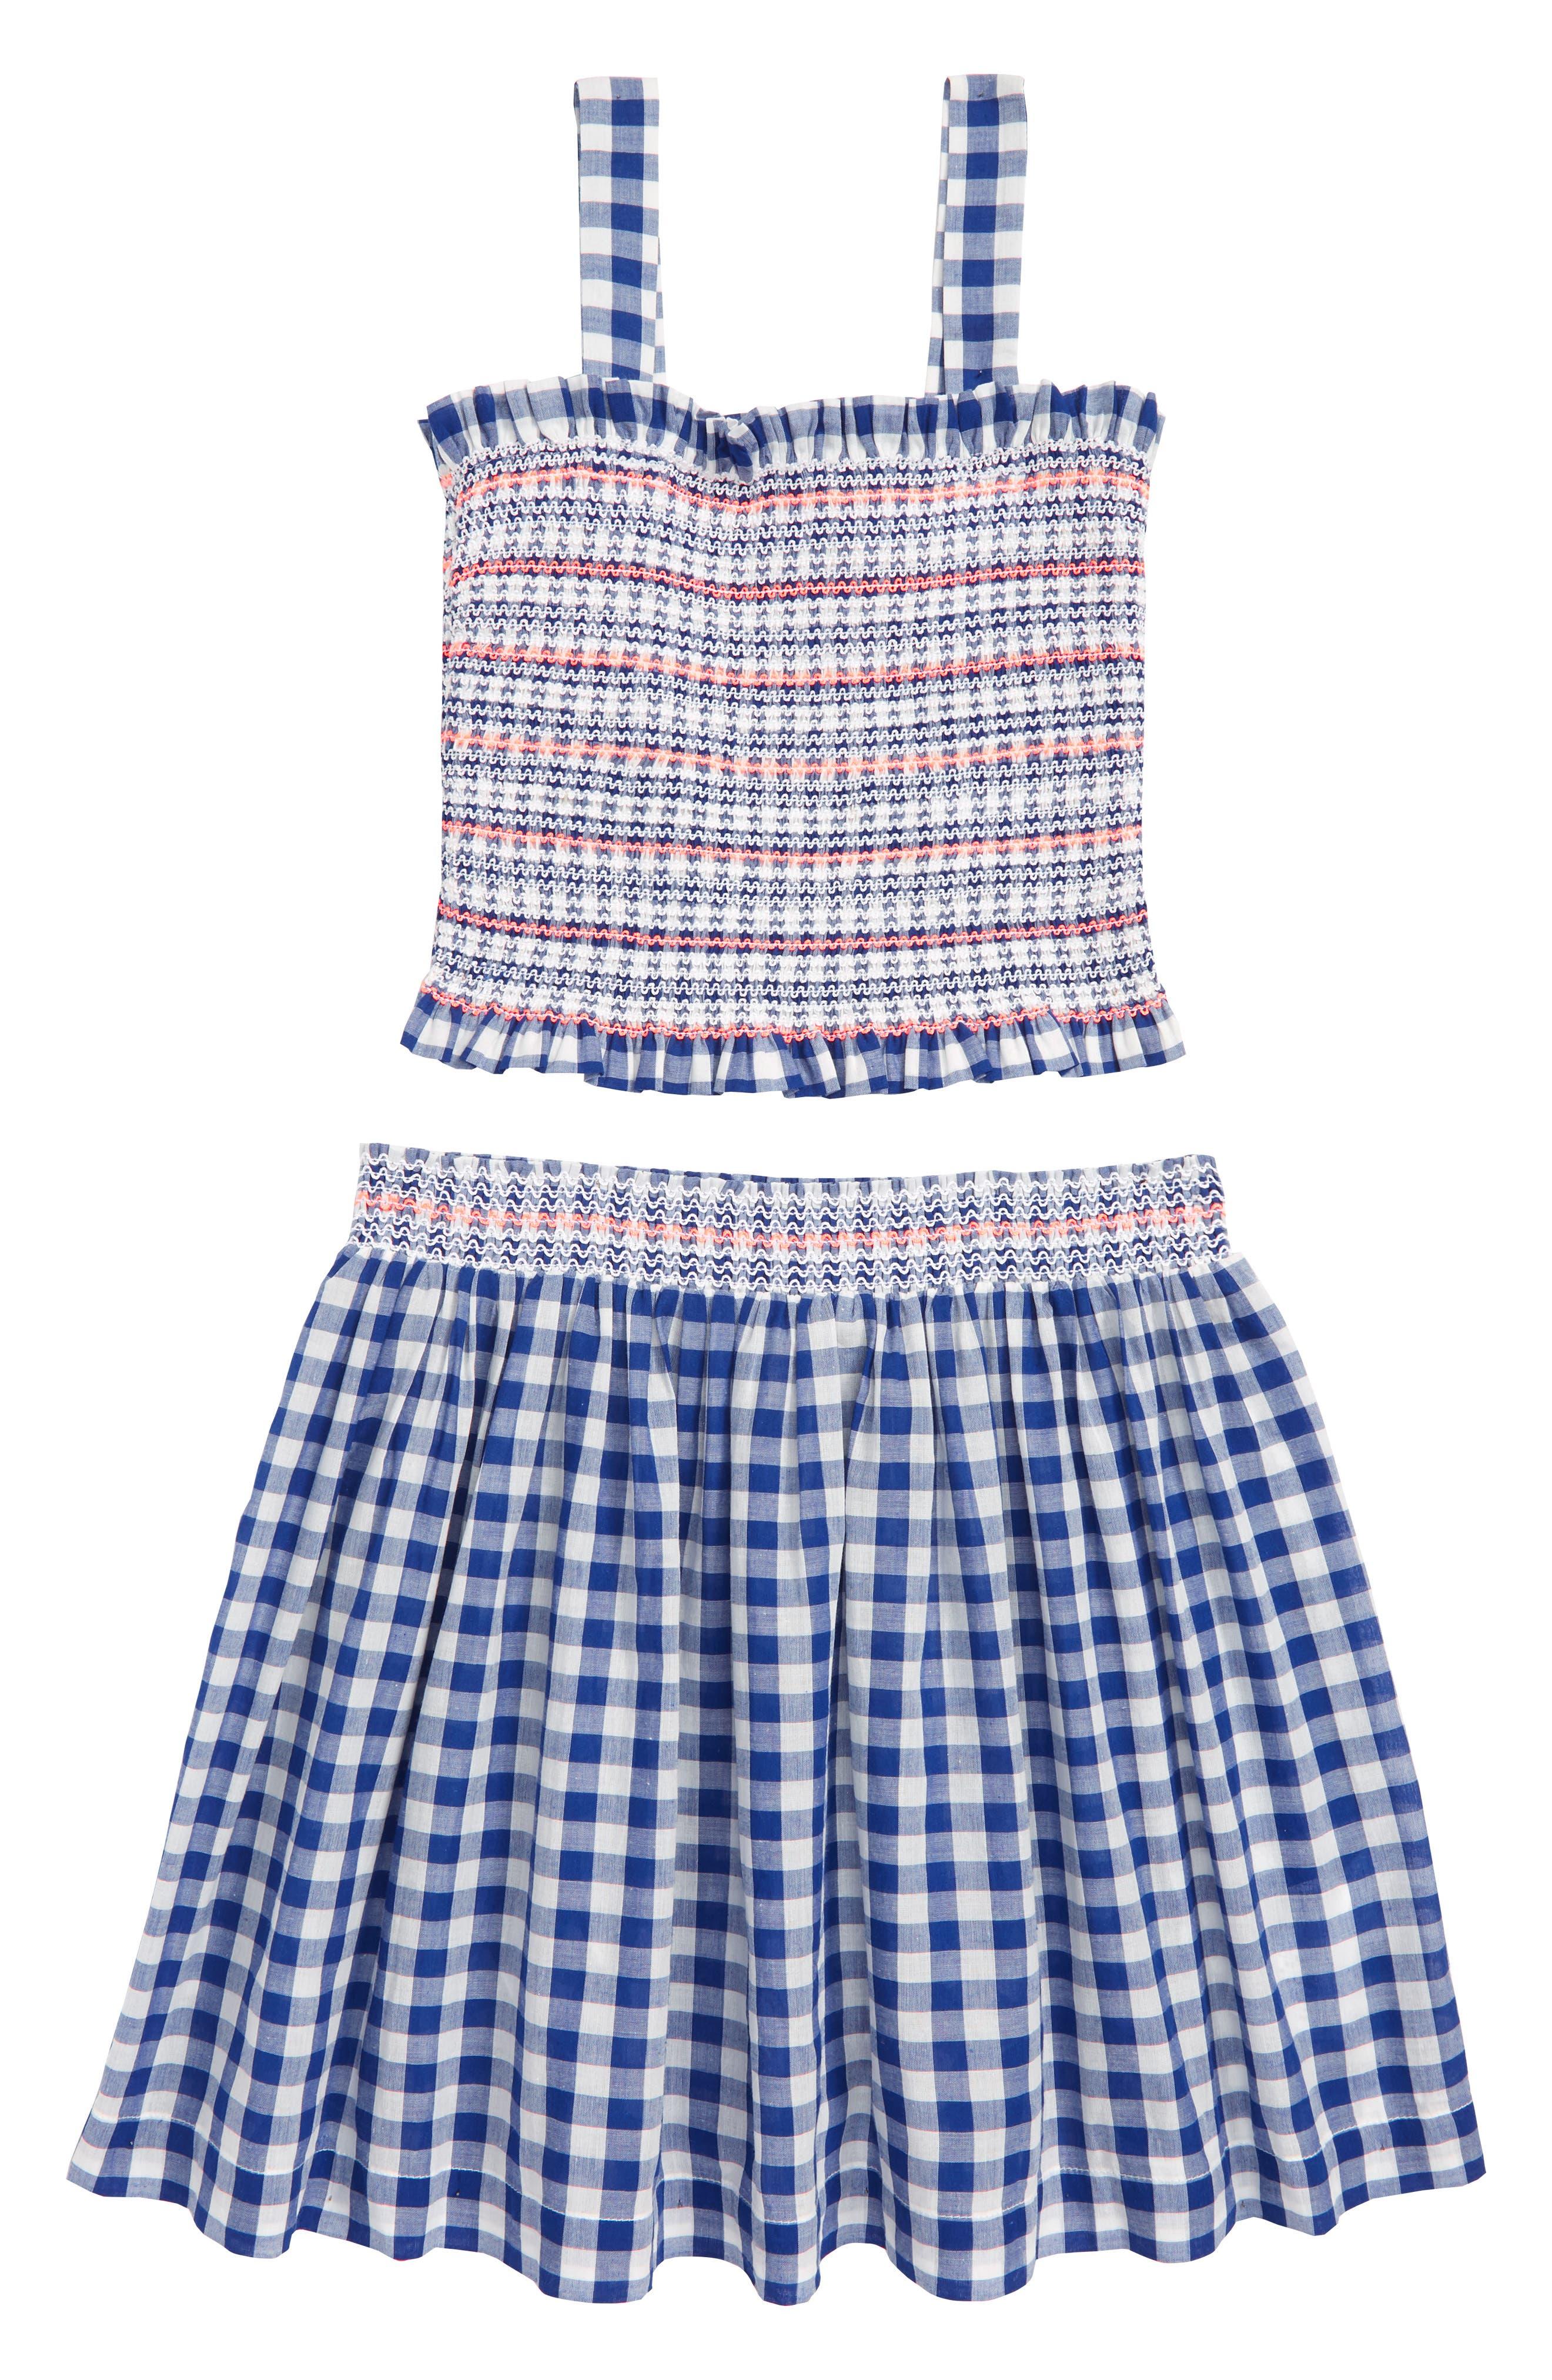 Gingham 2-Piece Dress,                             Main thumbnail 1, color,                             BRUNSWICK BLUE